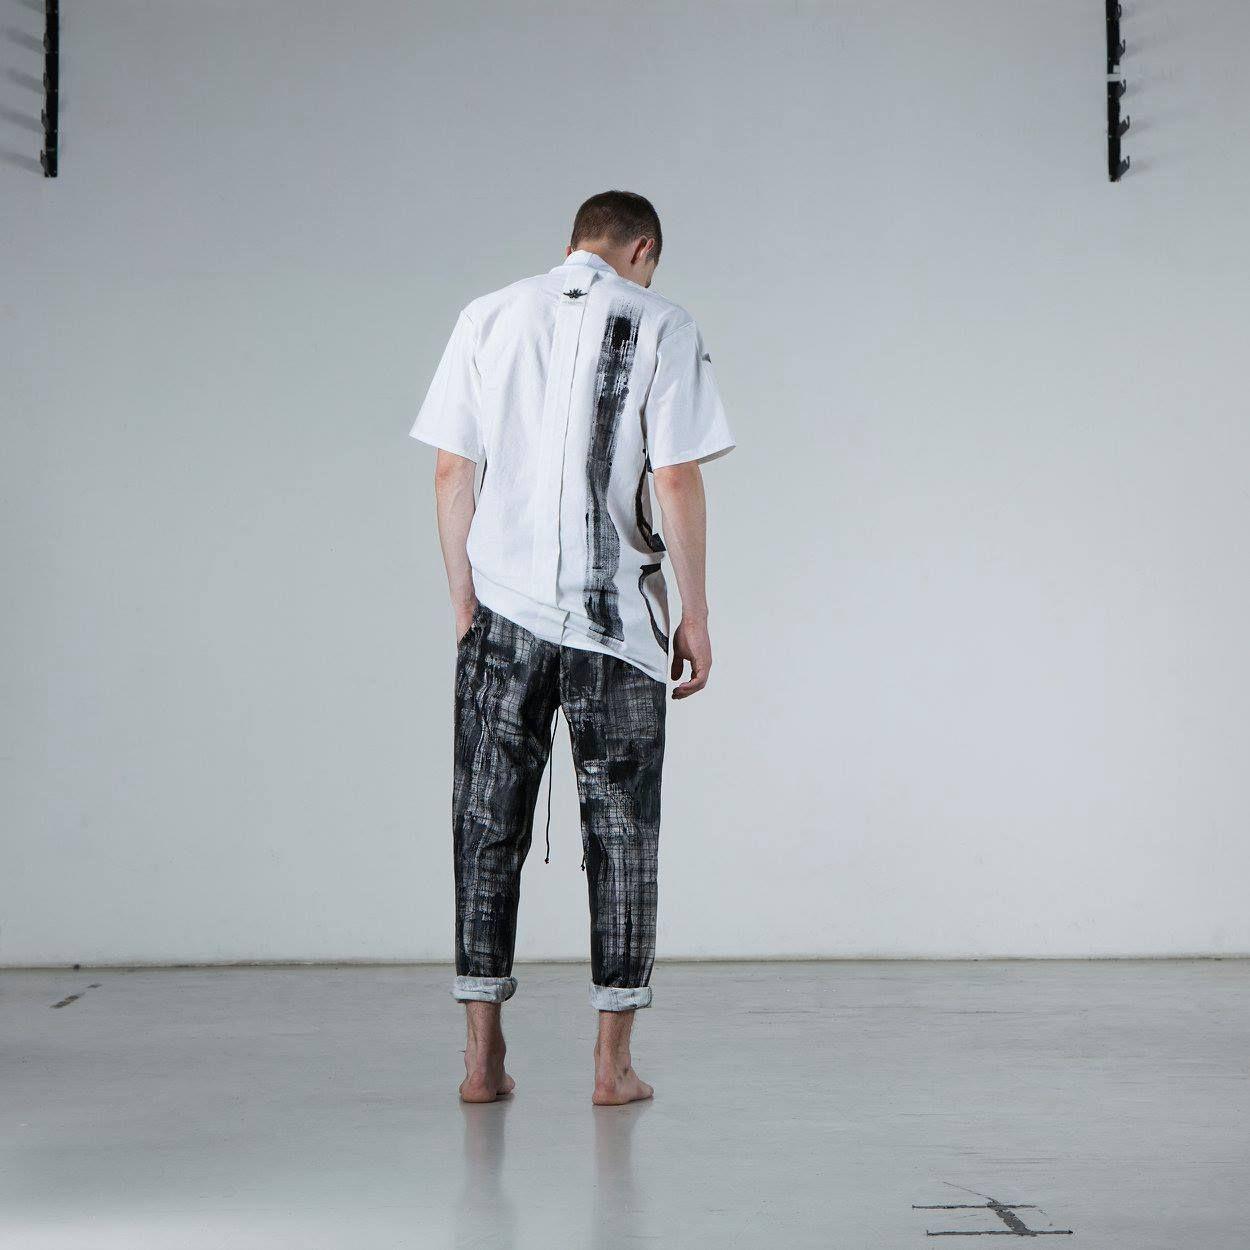 ZSIGMOND DORA Spring Summer 2016 Primavera Verano - #Menswear #Trends #Tendencias #Moda Hombre - CNMT